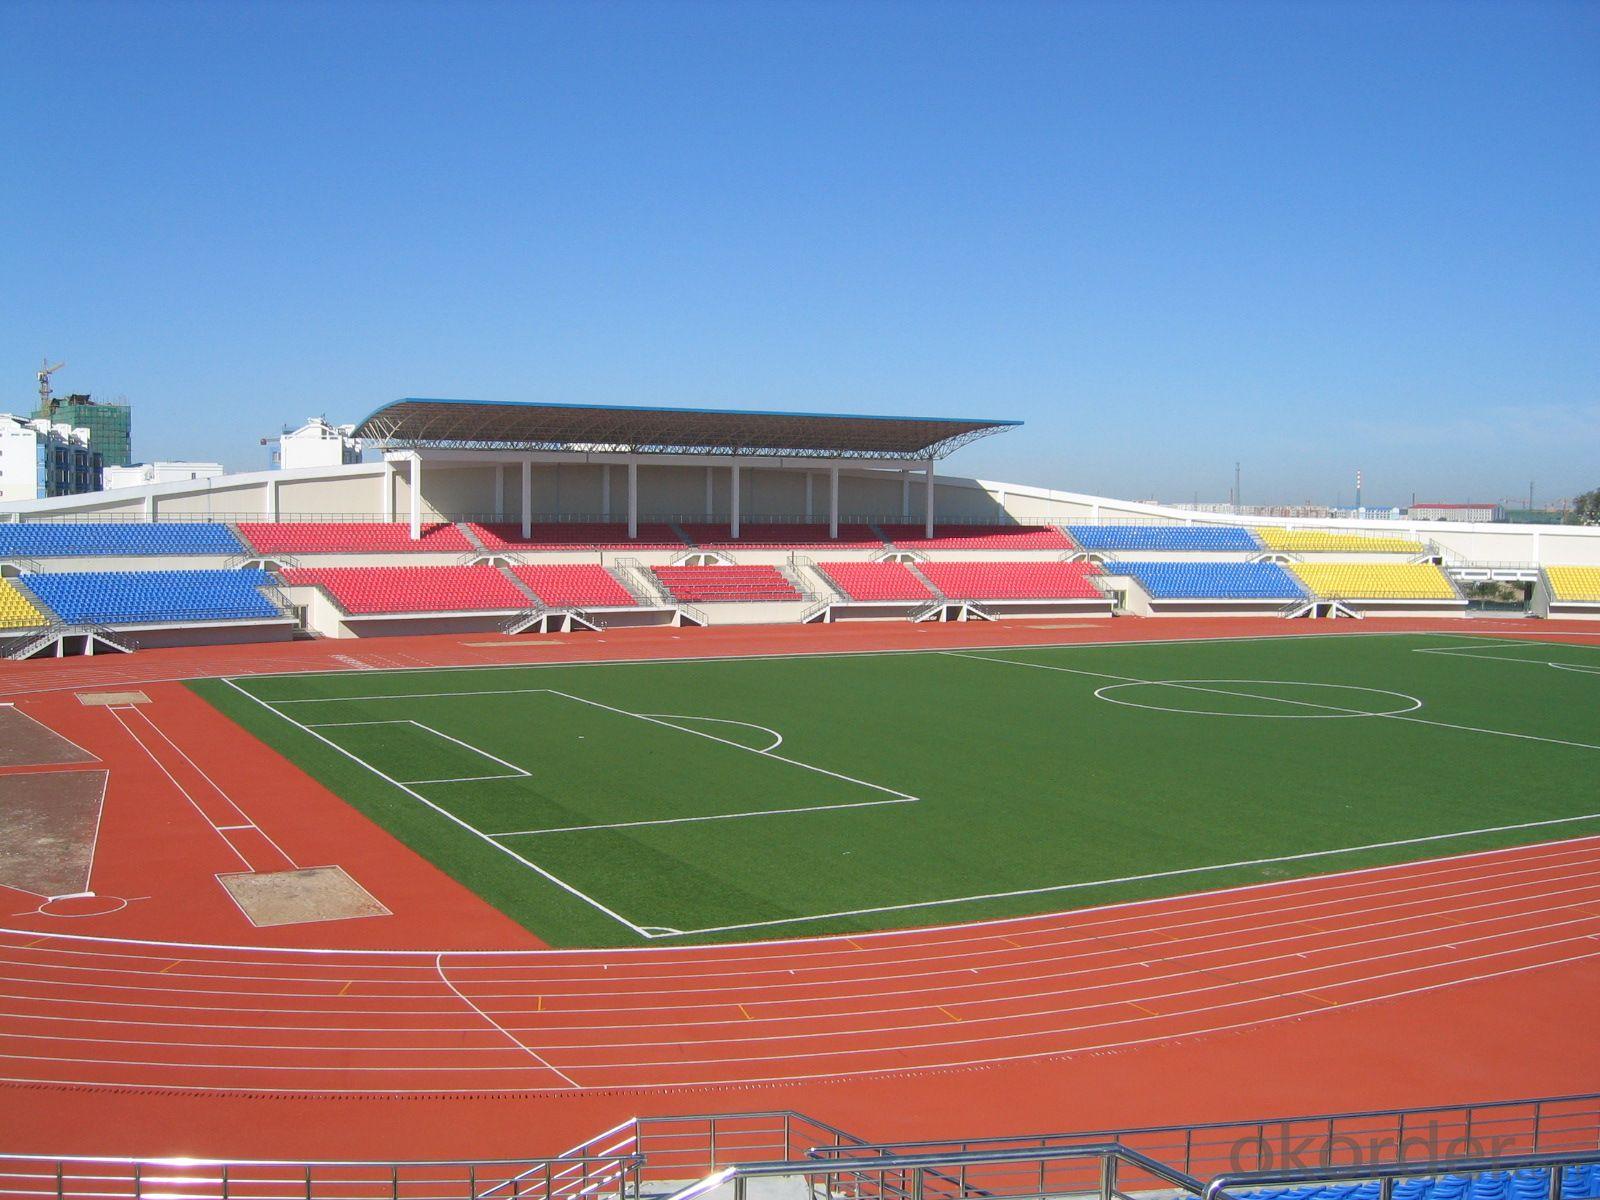 Raw Material Artificial Turf Tennis Court Artificial Grass in Football Field